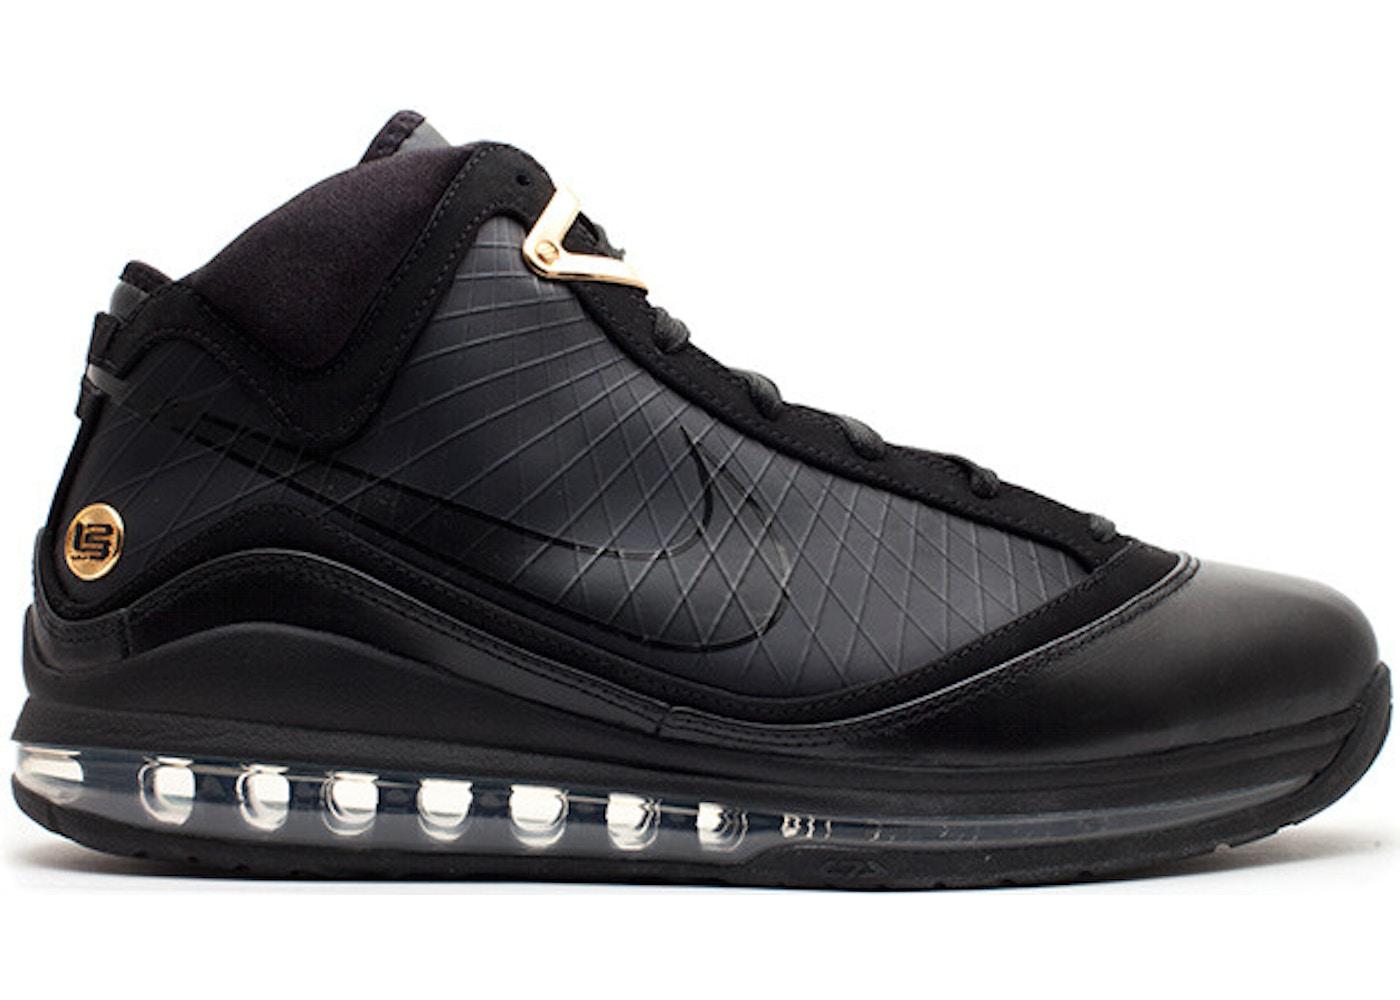 437f889b322c Nike LeBron 7 Shoes - Last Sale